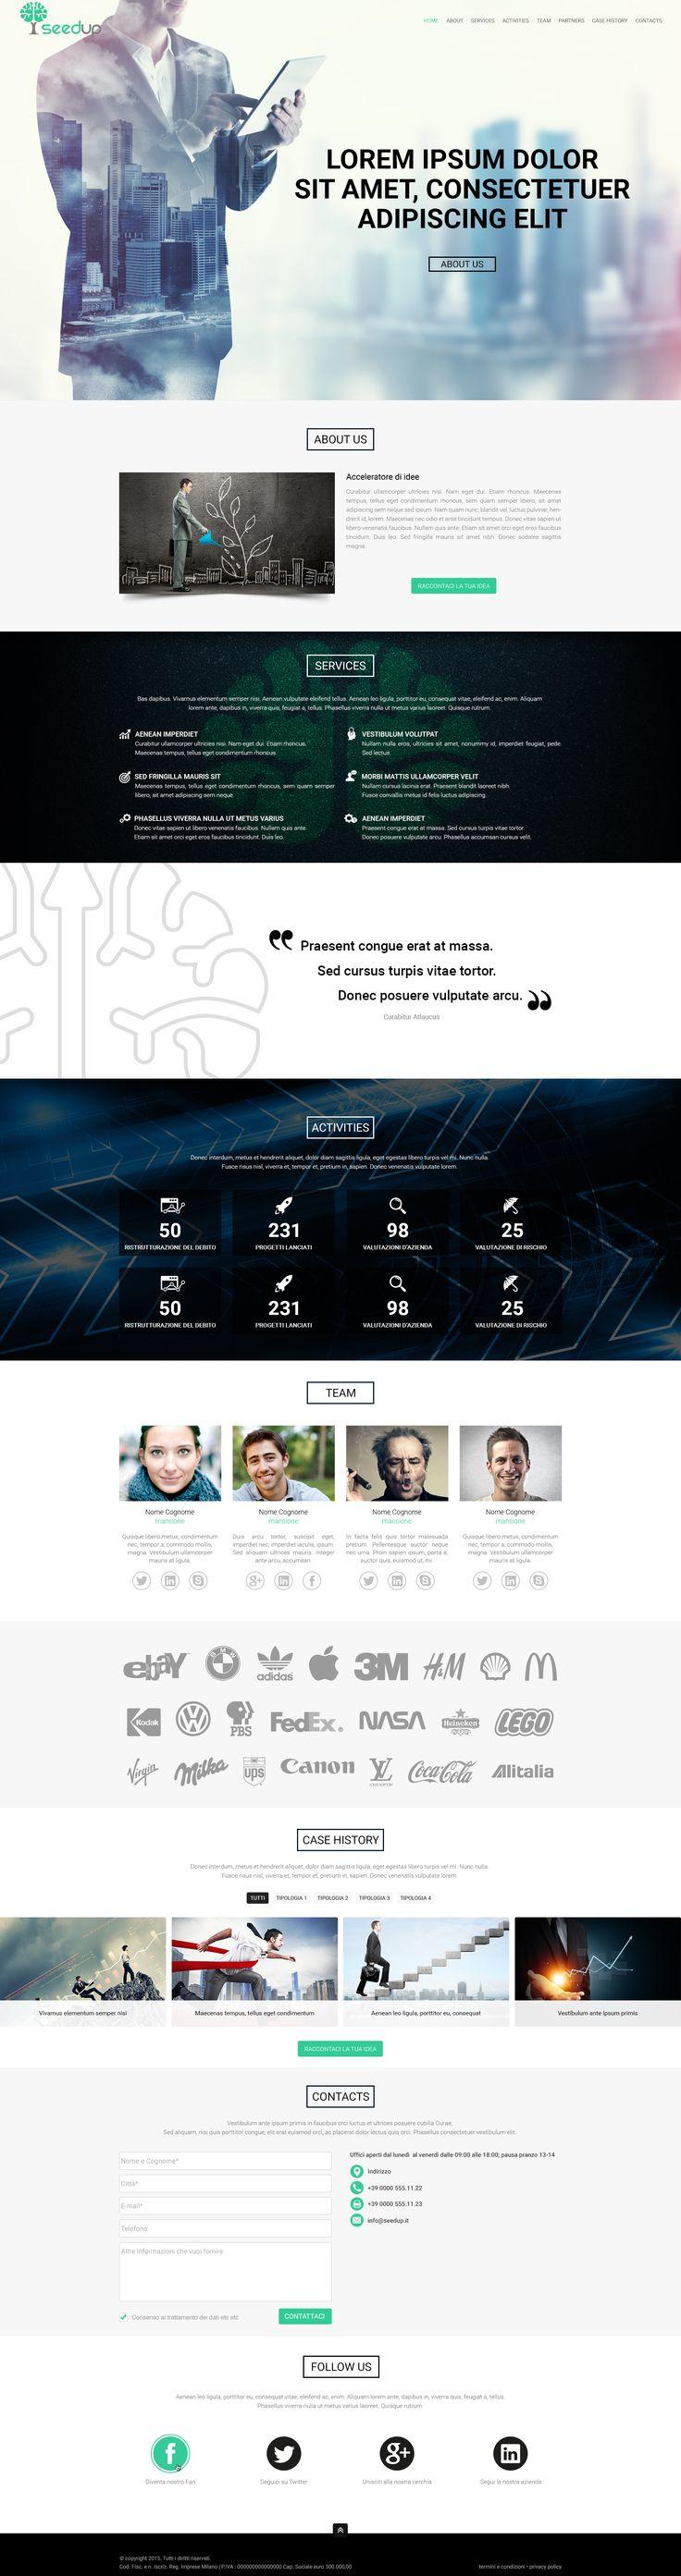 SeedUp - Bozza: Project Manager - Wordpress Designer